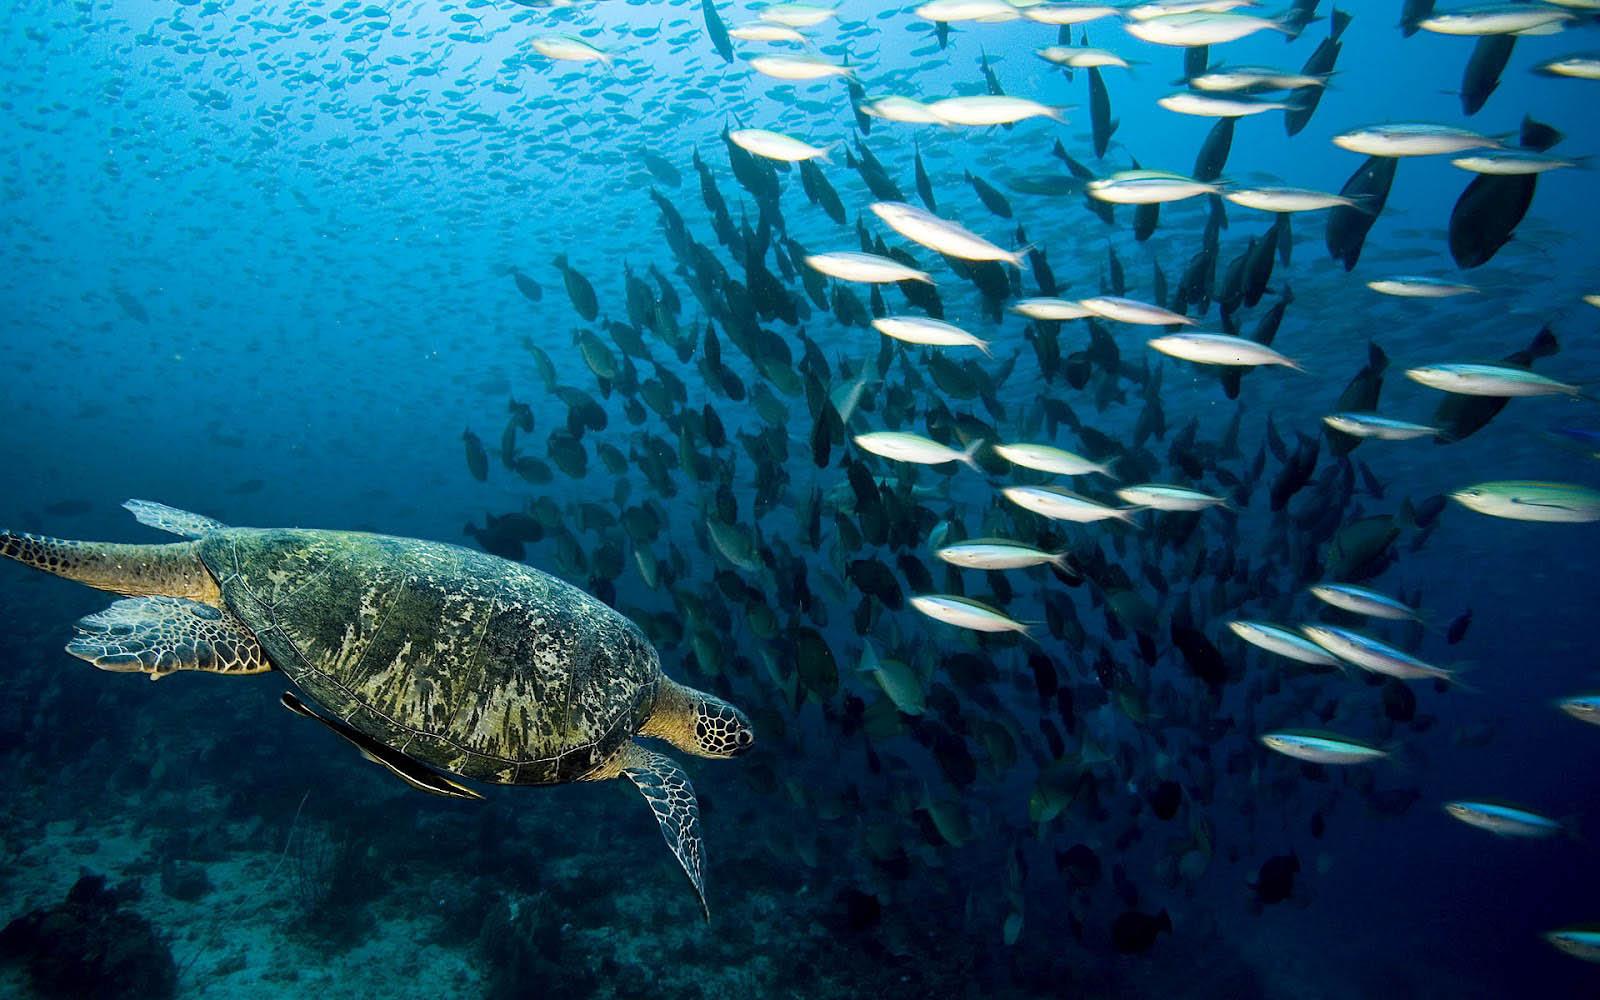 Ikan Dasar Laut 2  dam Background